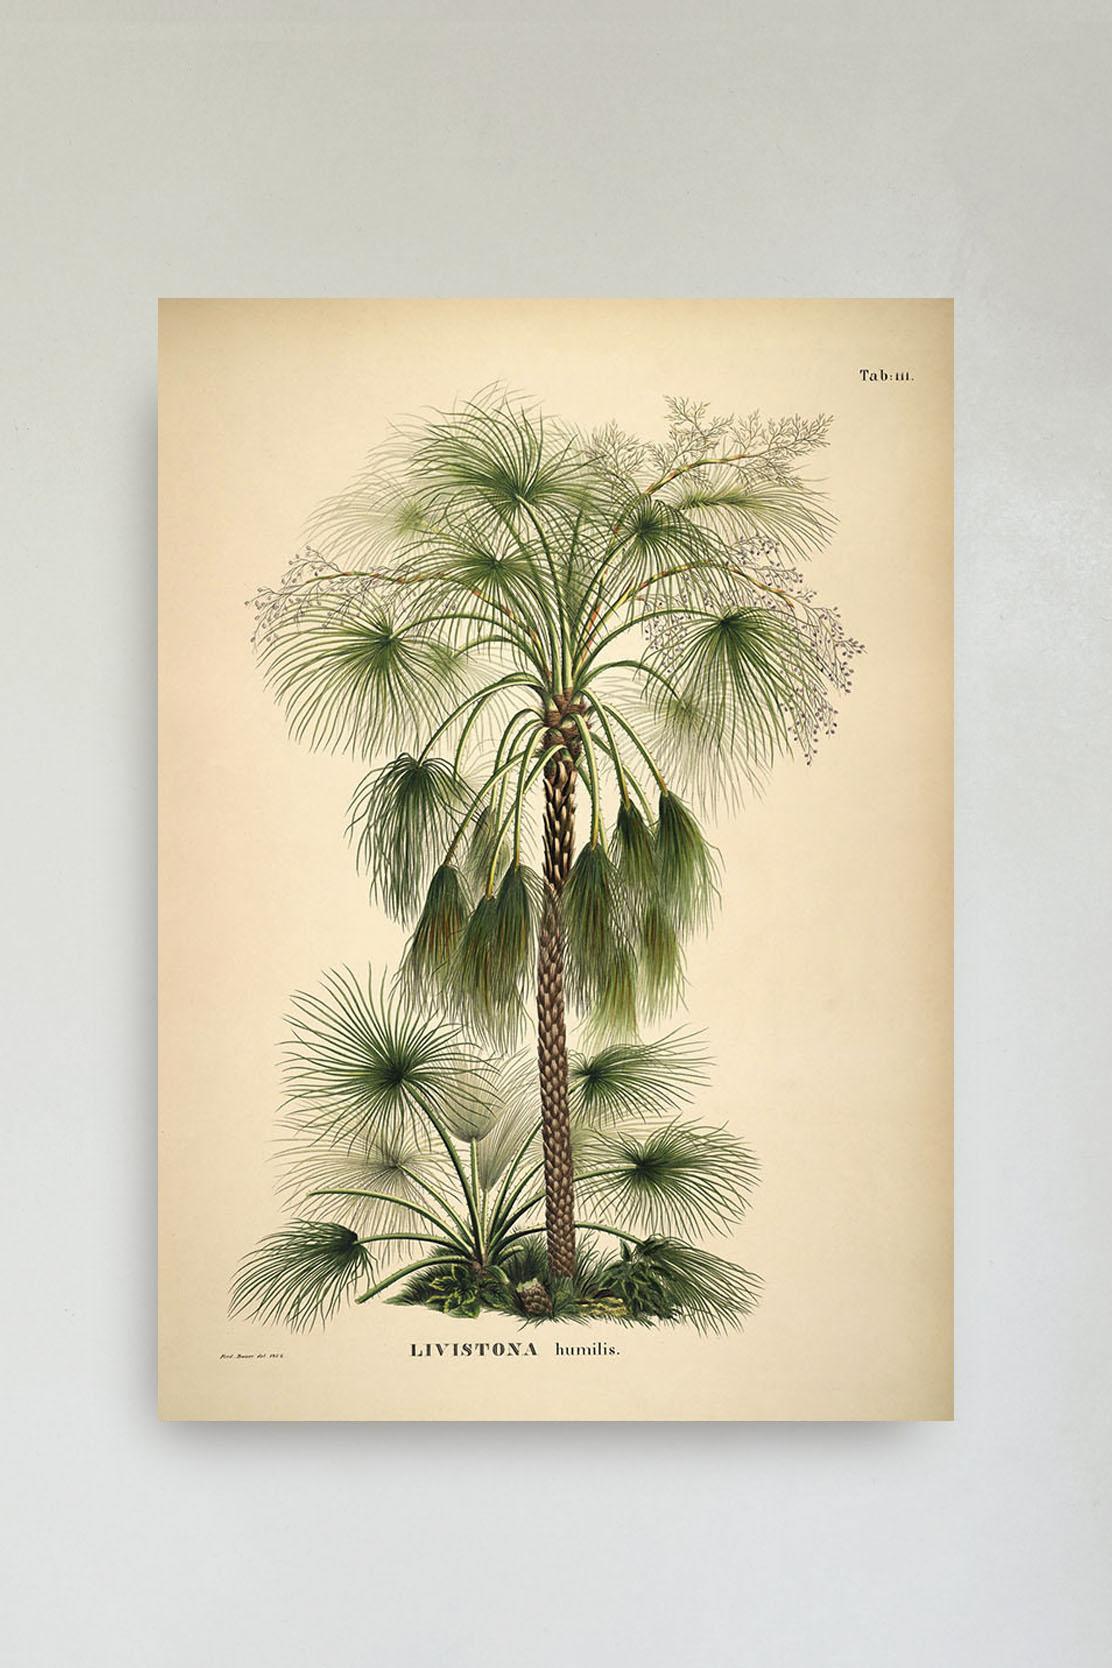 Livistona Humilis